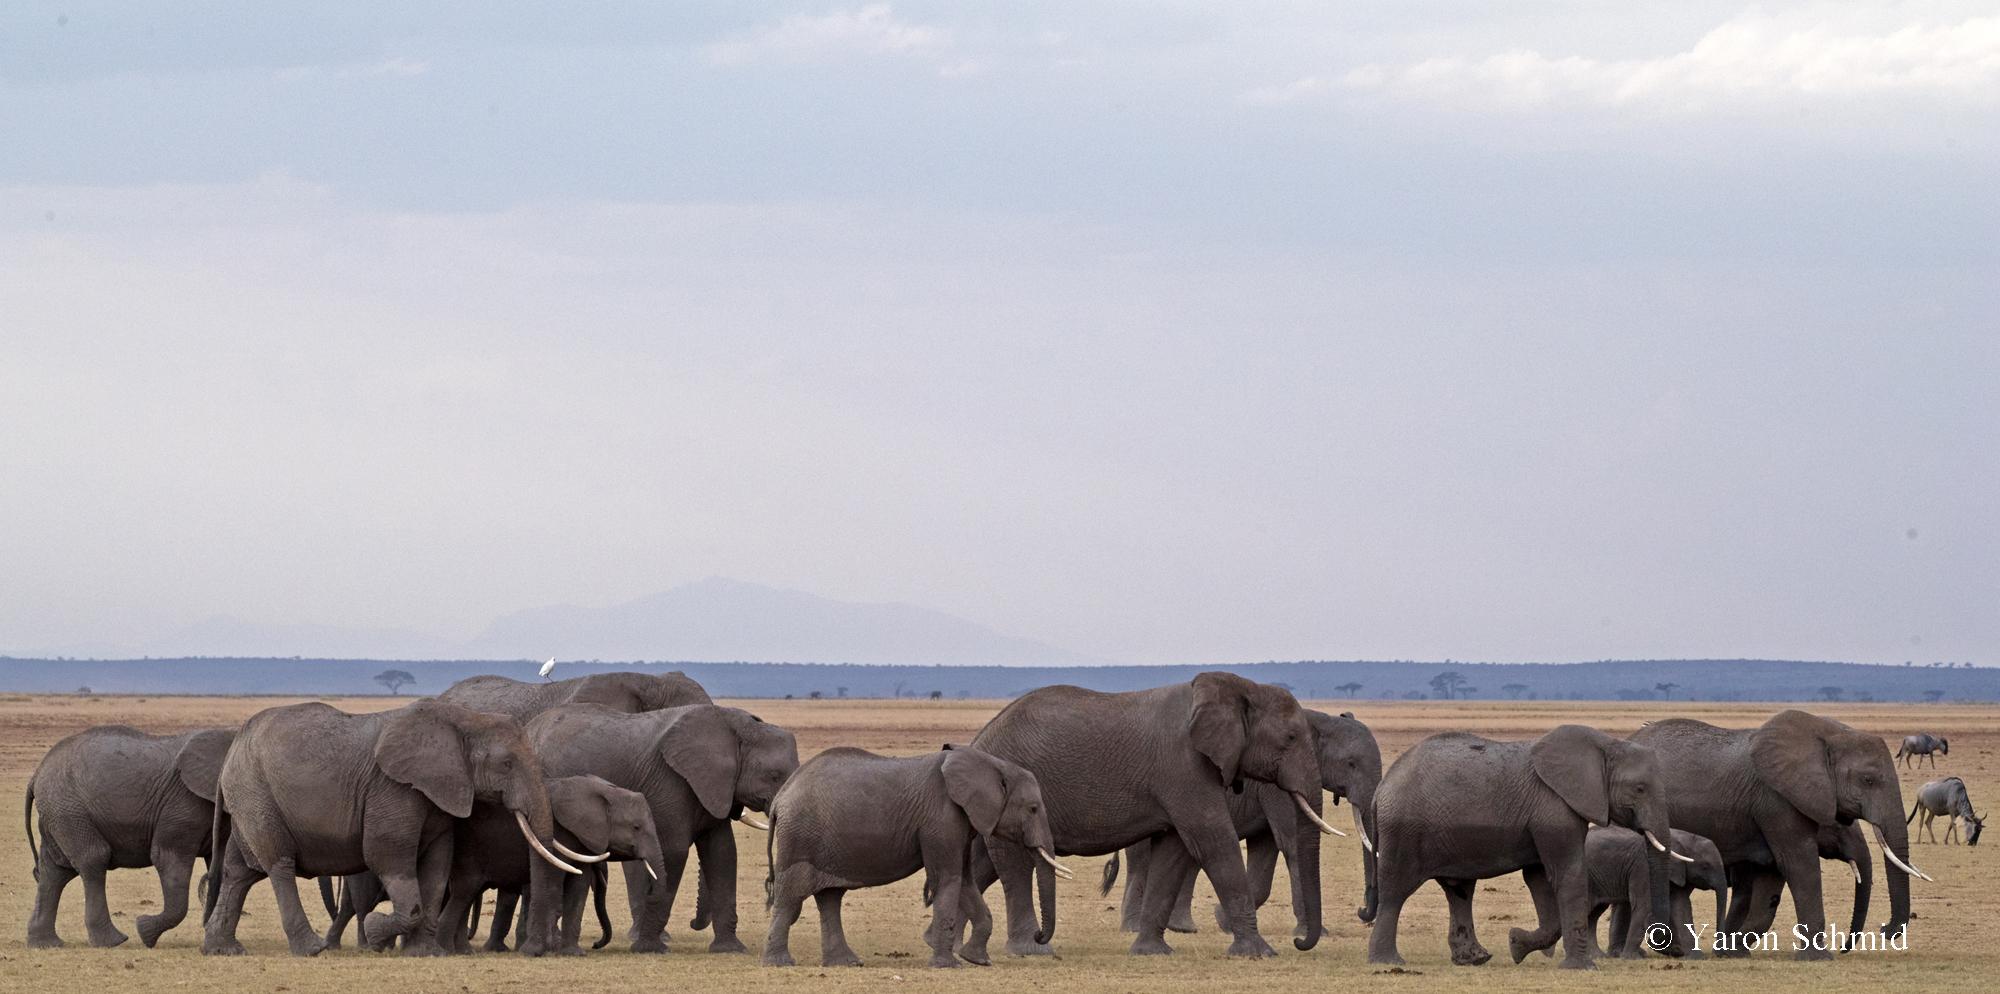 Postcard from Amboseli